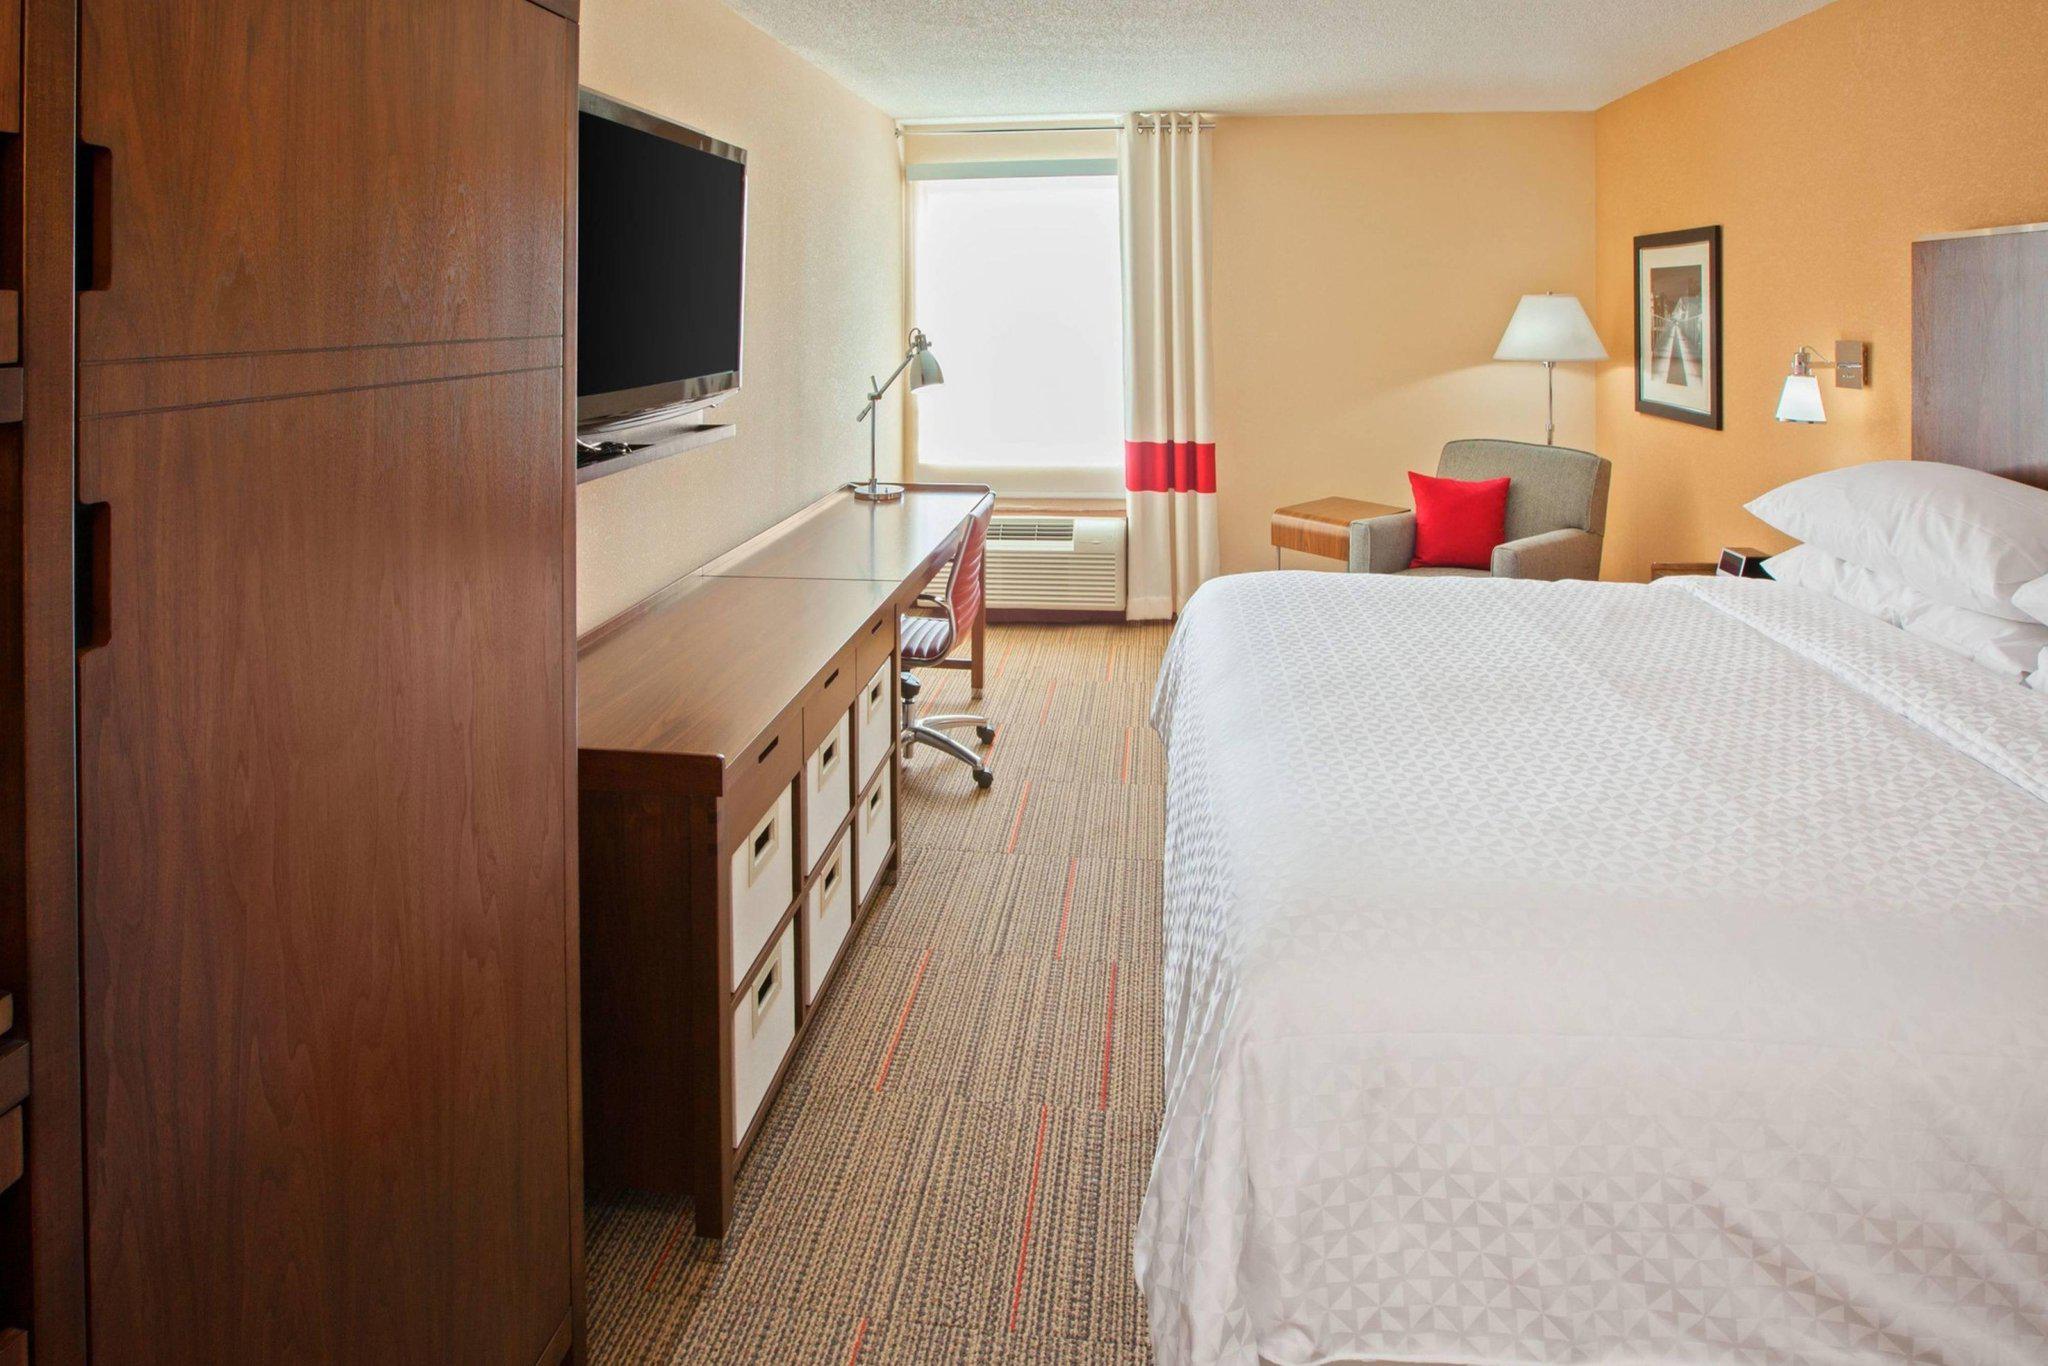 Fairfield Inn & Suites by Marriott Chattanooga